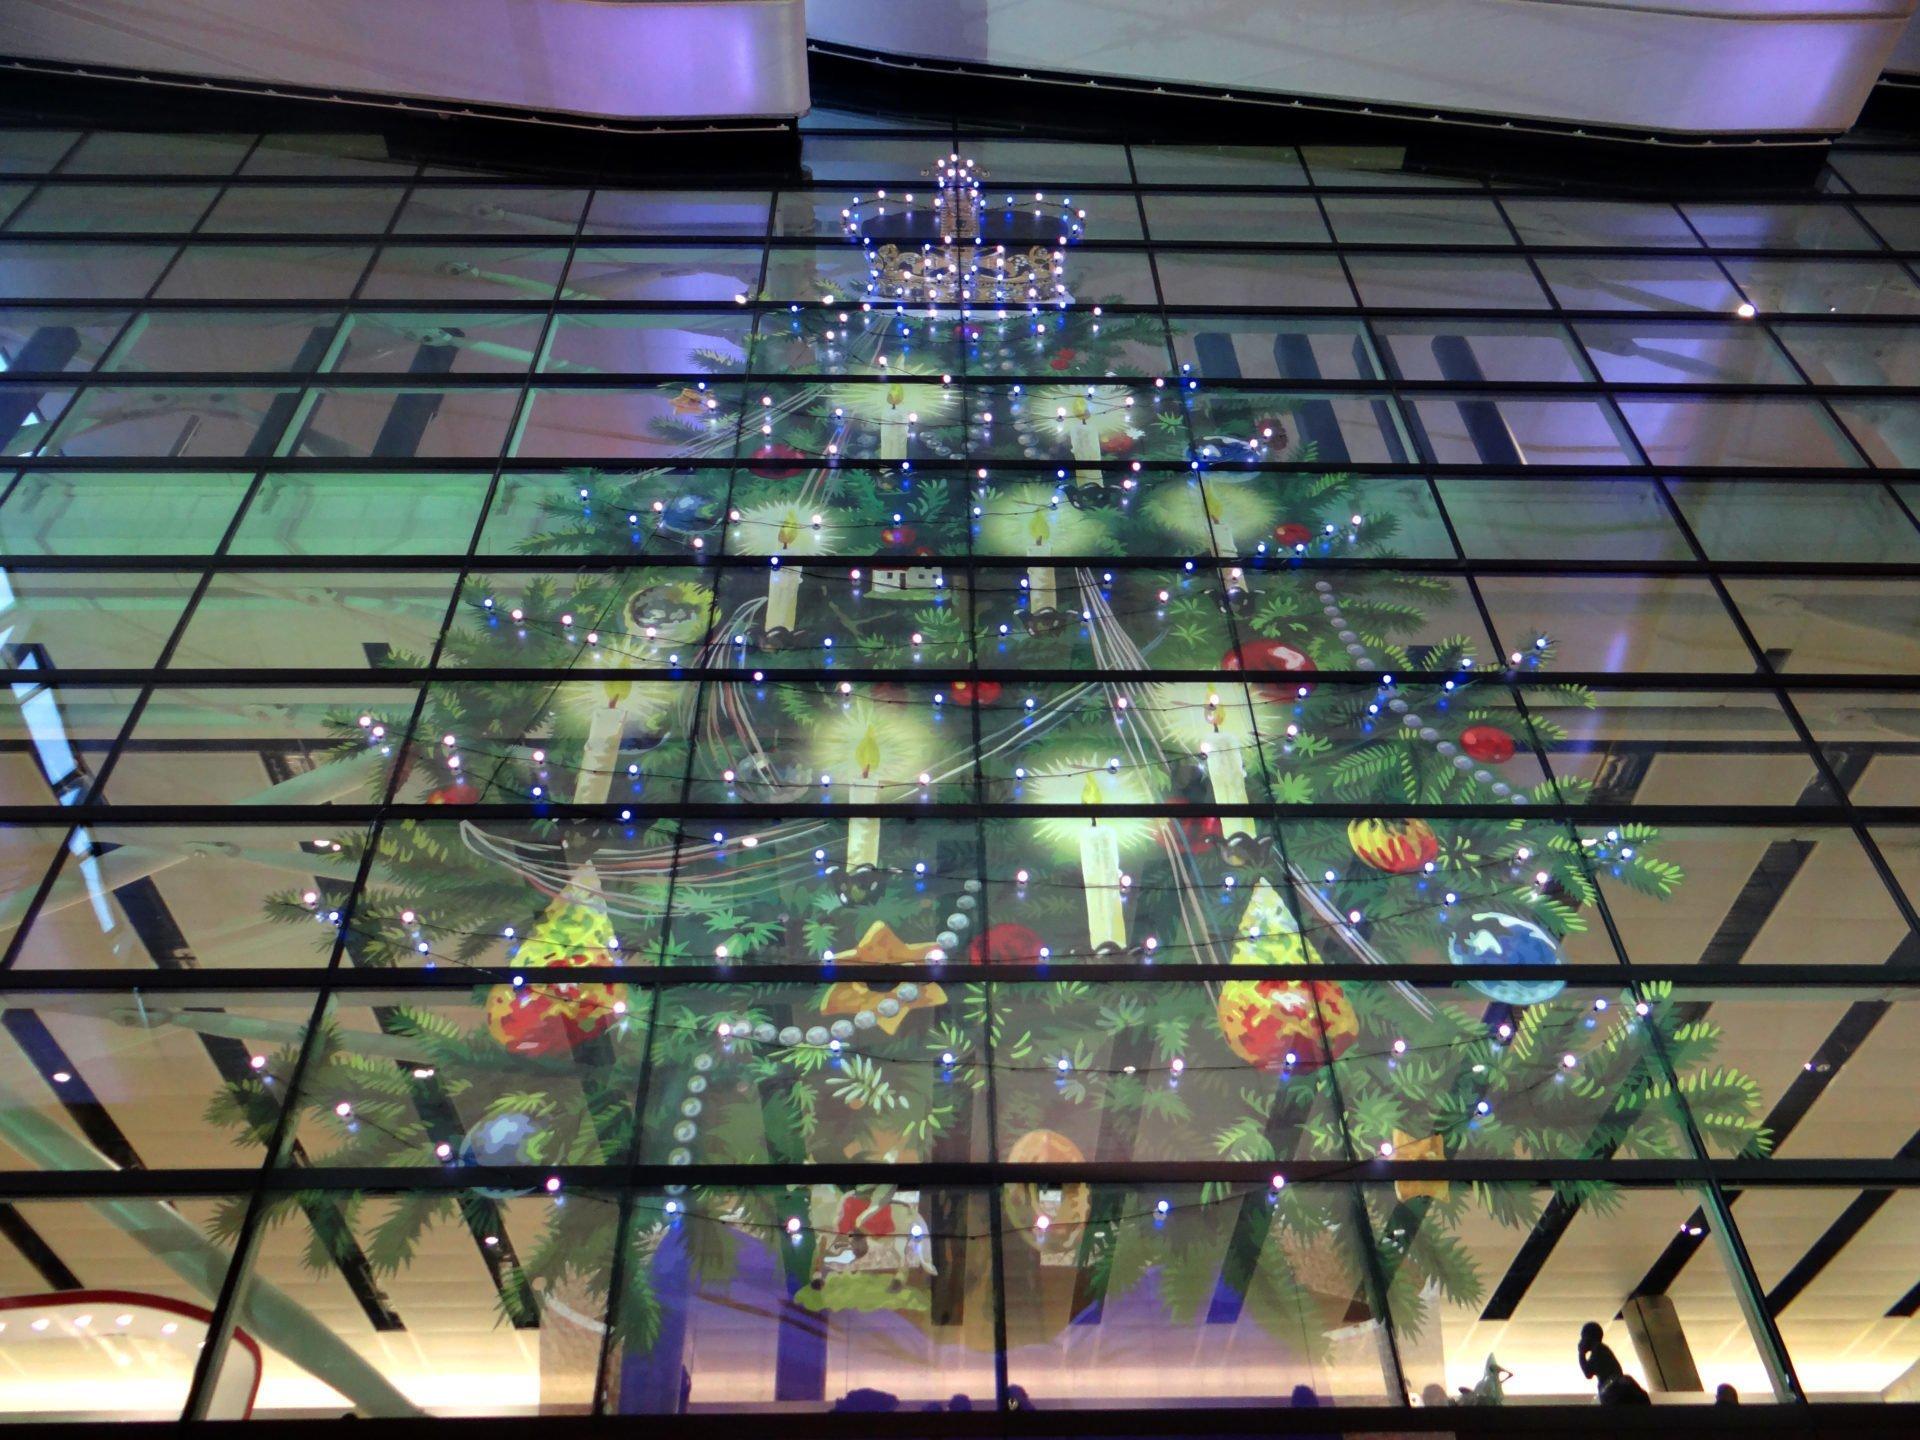 heathrow-airport-uk-does-one-way-window-film-work-at-night